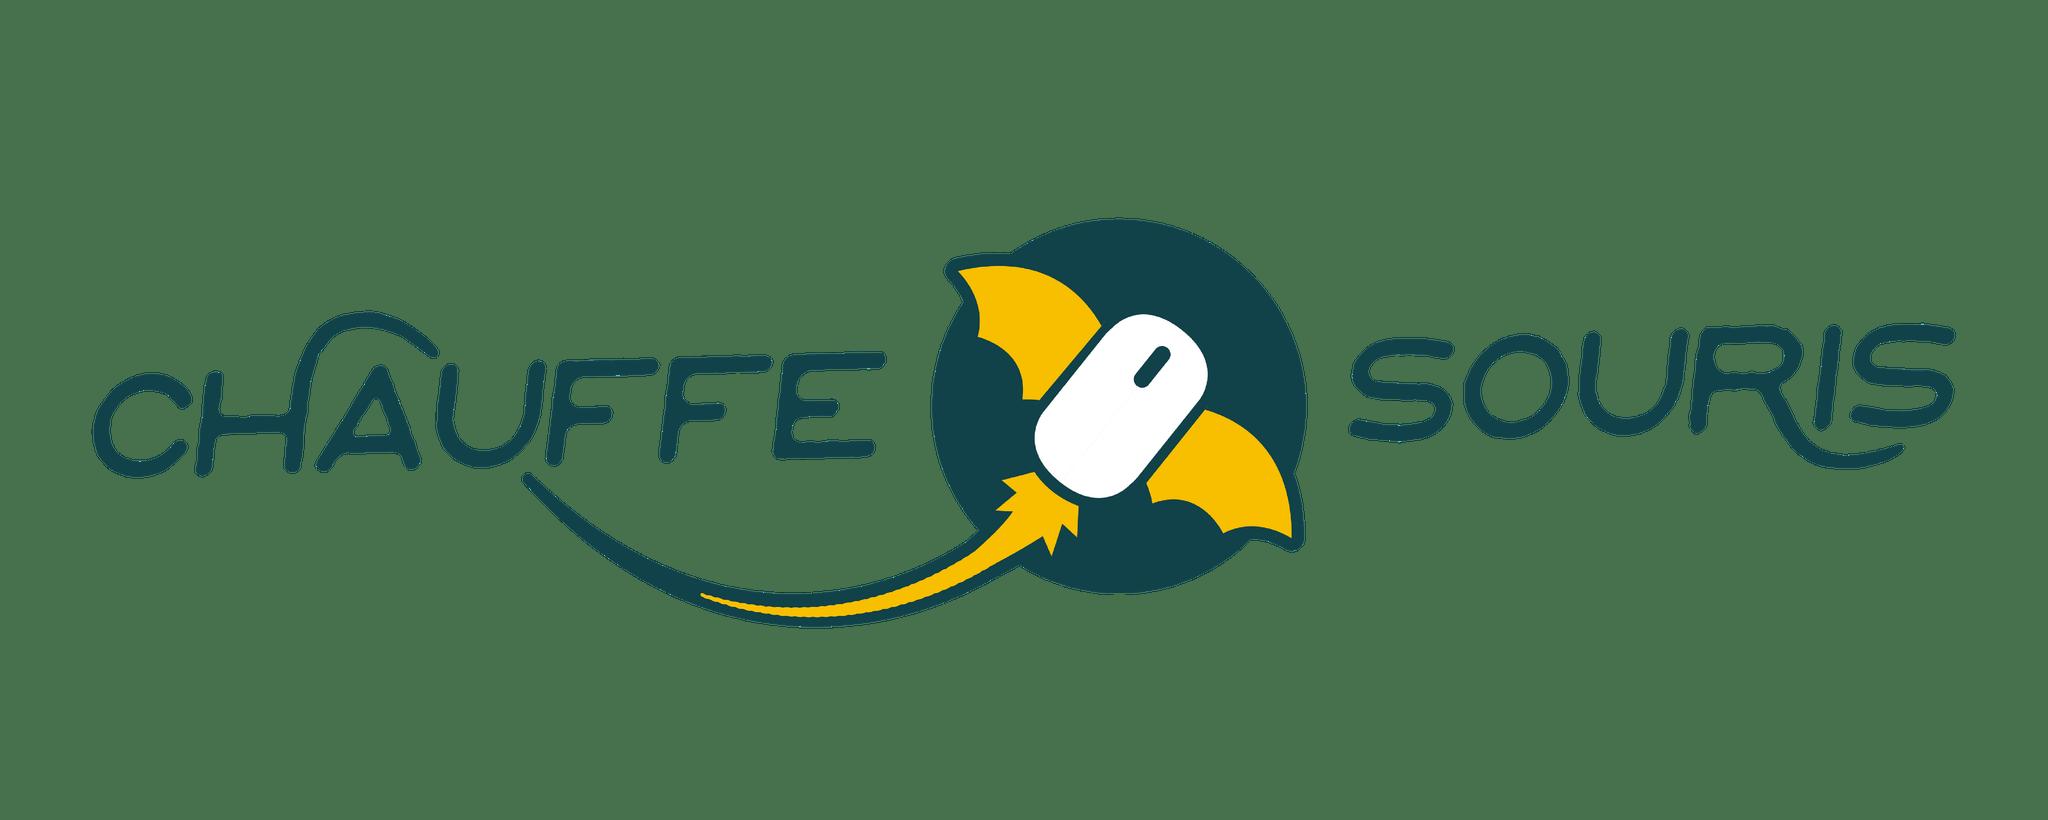 CHAUFFE-SOURIS